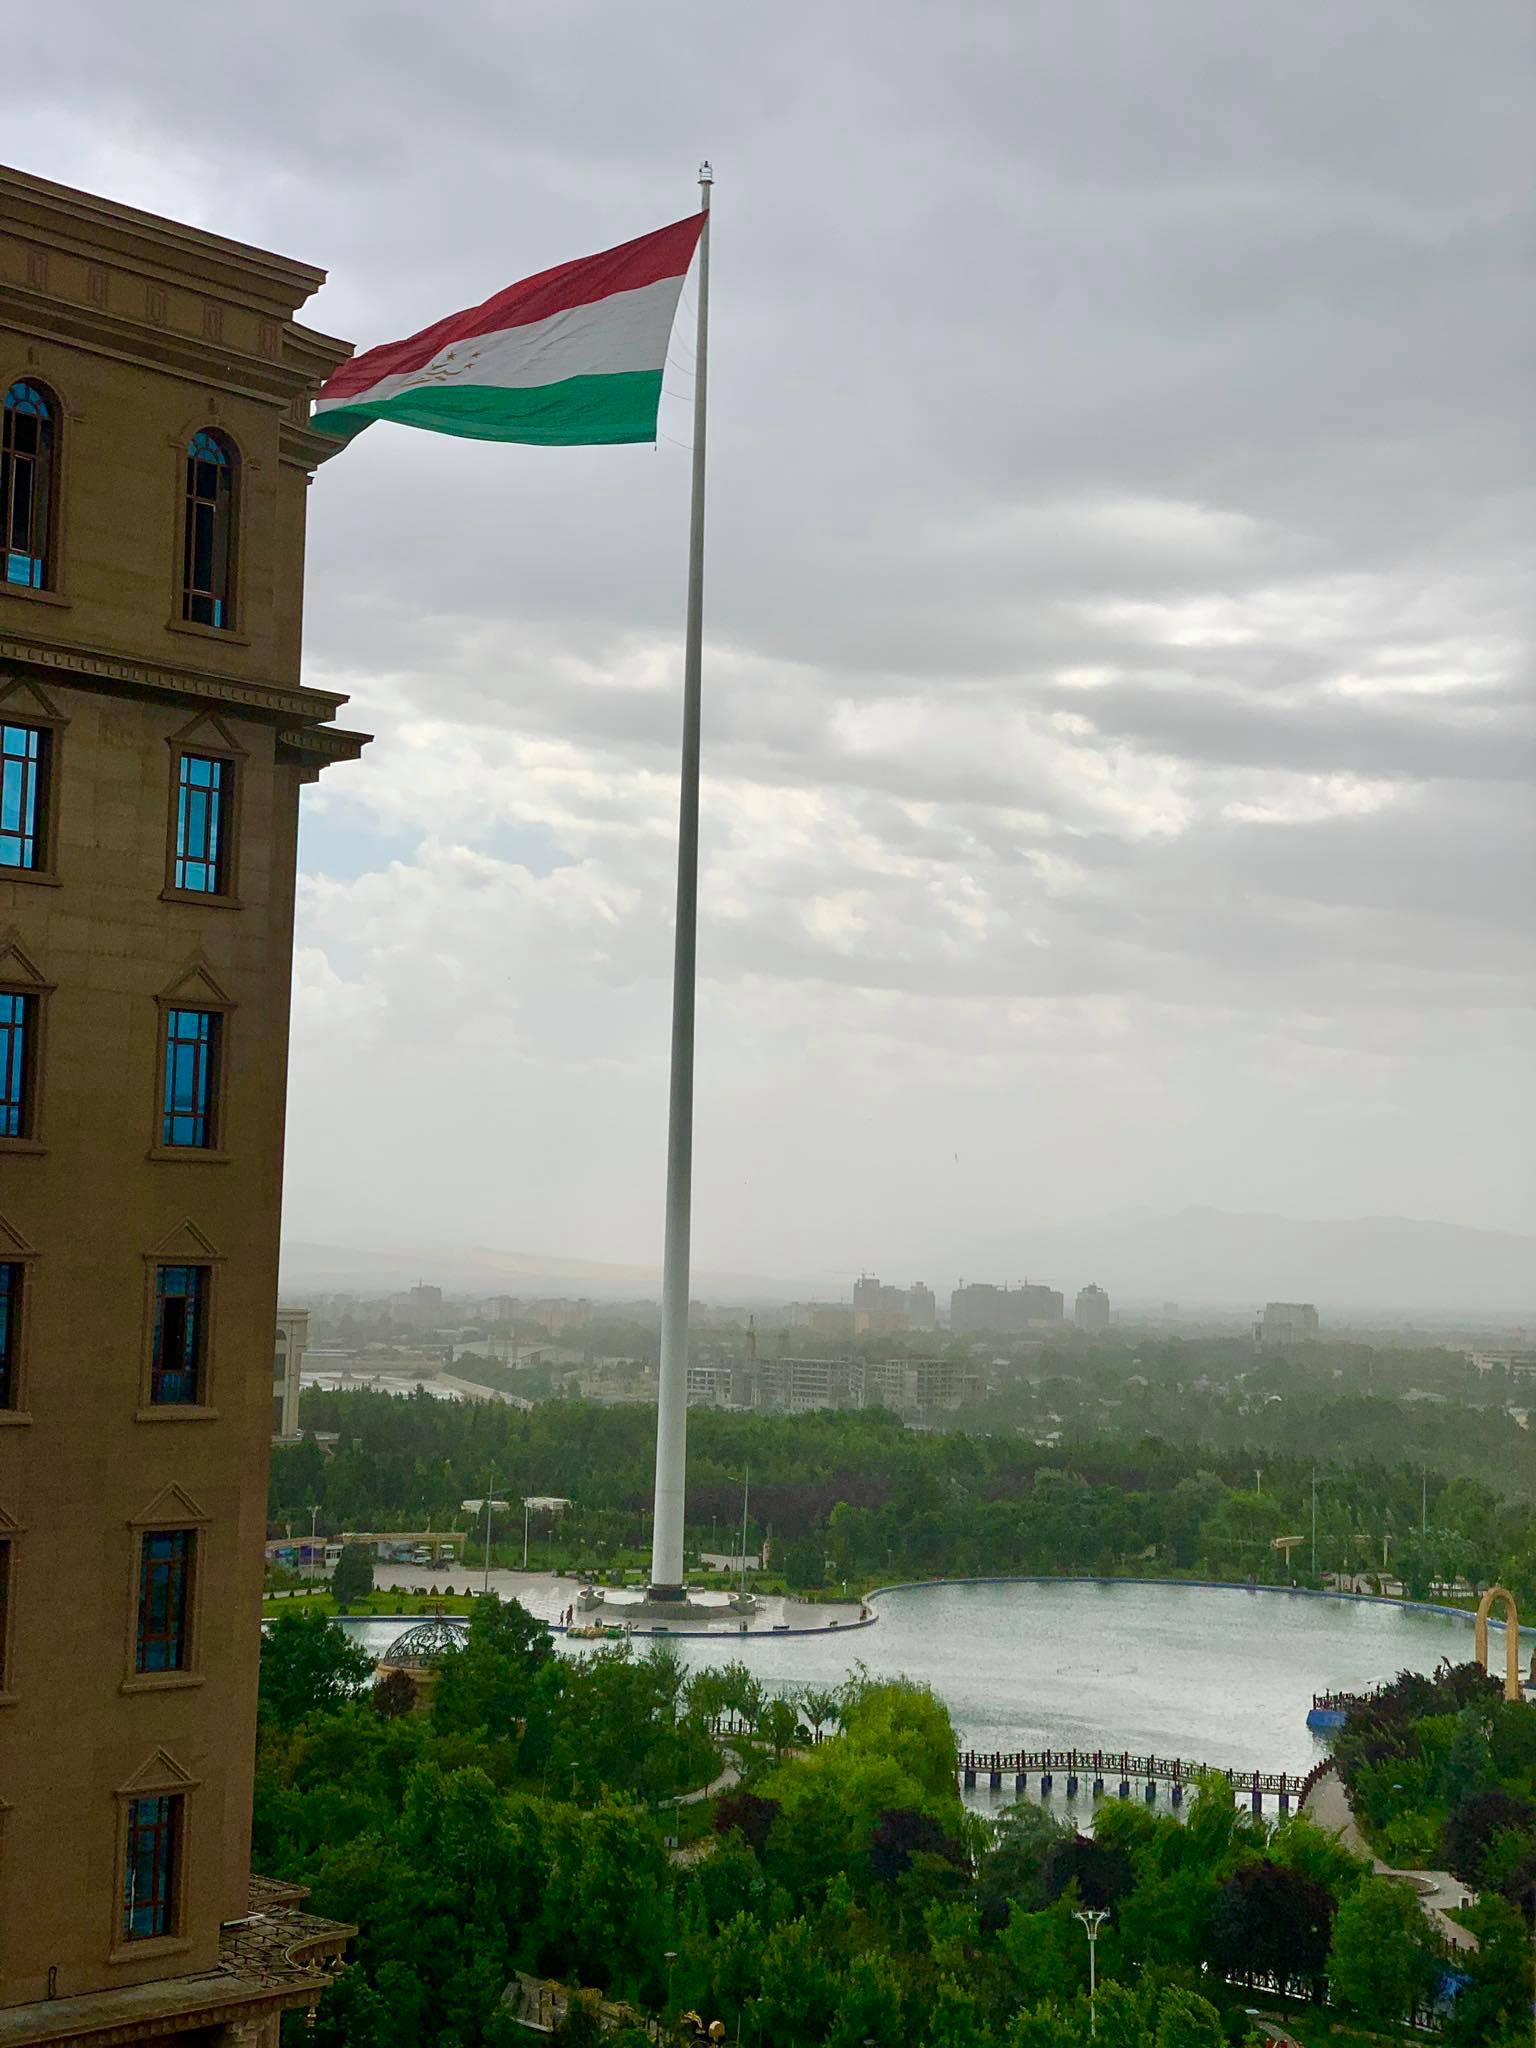 Kach Solo Travels in 2019 I just arrived in Dushanbe, Tajikistan21.jpg